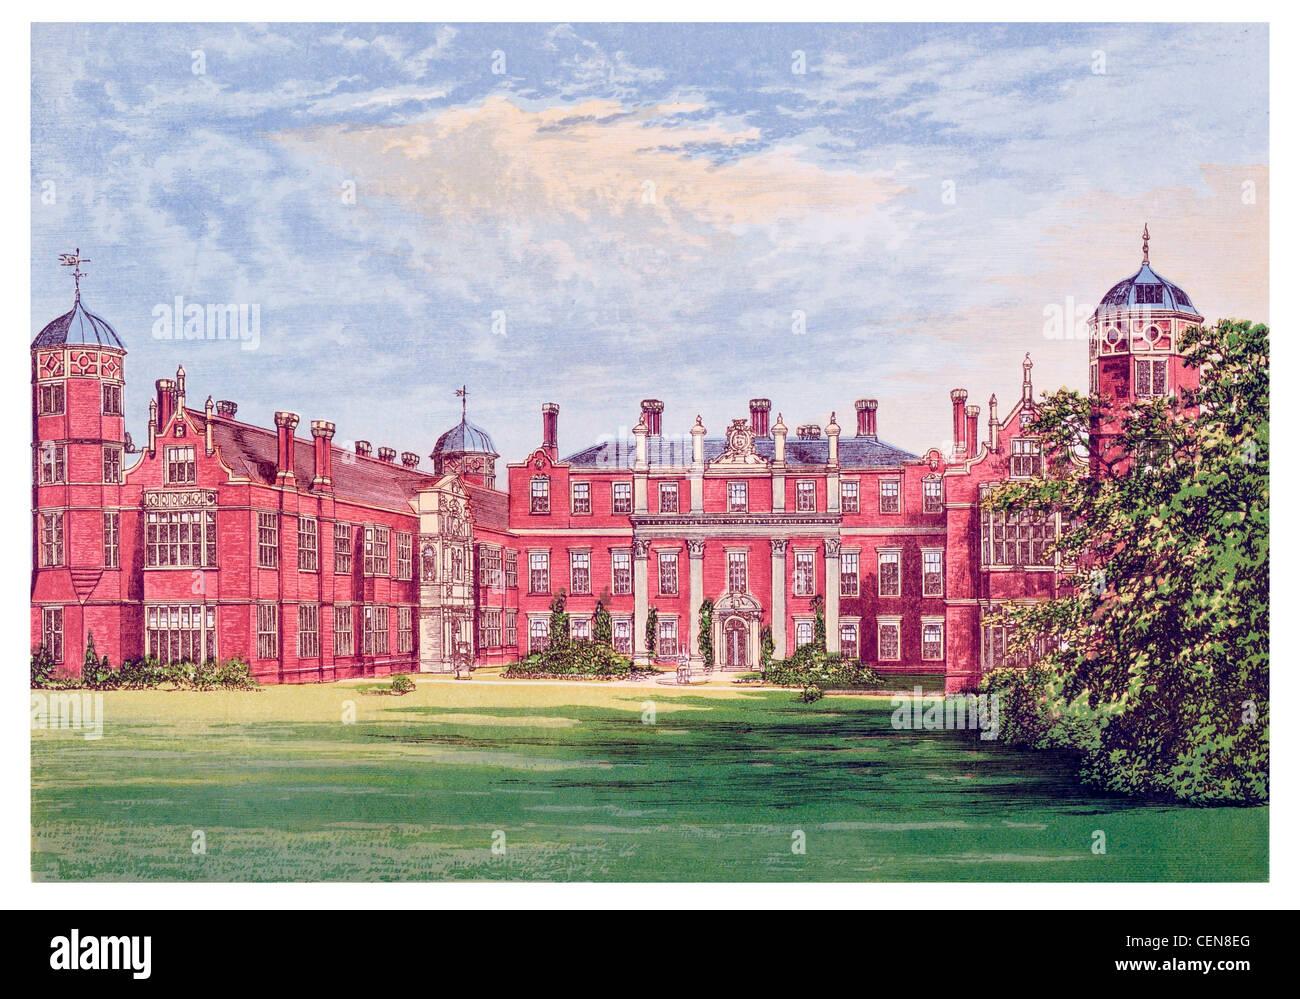 Cobham Hall Stock Photos & Cobham Hall Stock Images - Alamy